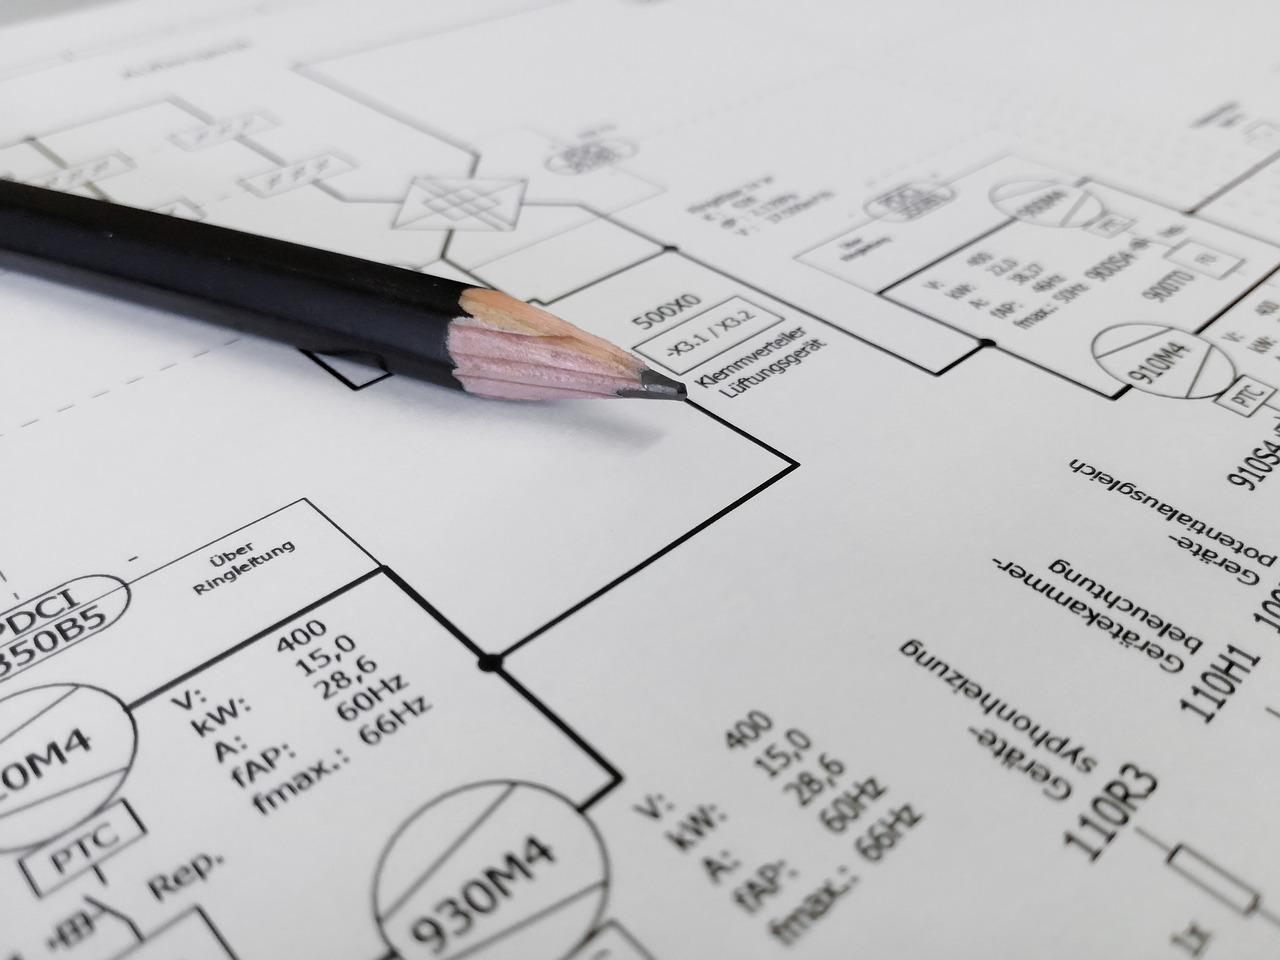 distributor,plan,wiring diagram,electric ,electronics,elektrik,current,distributors